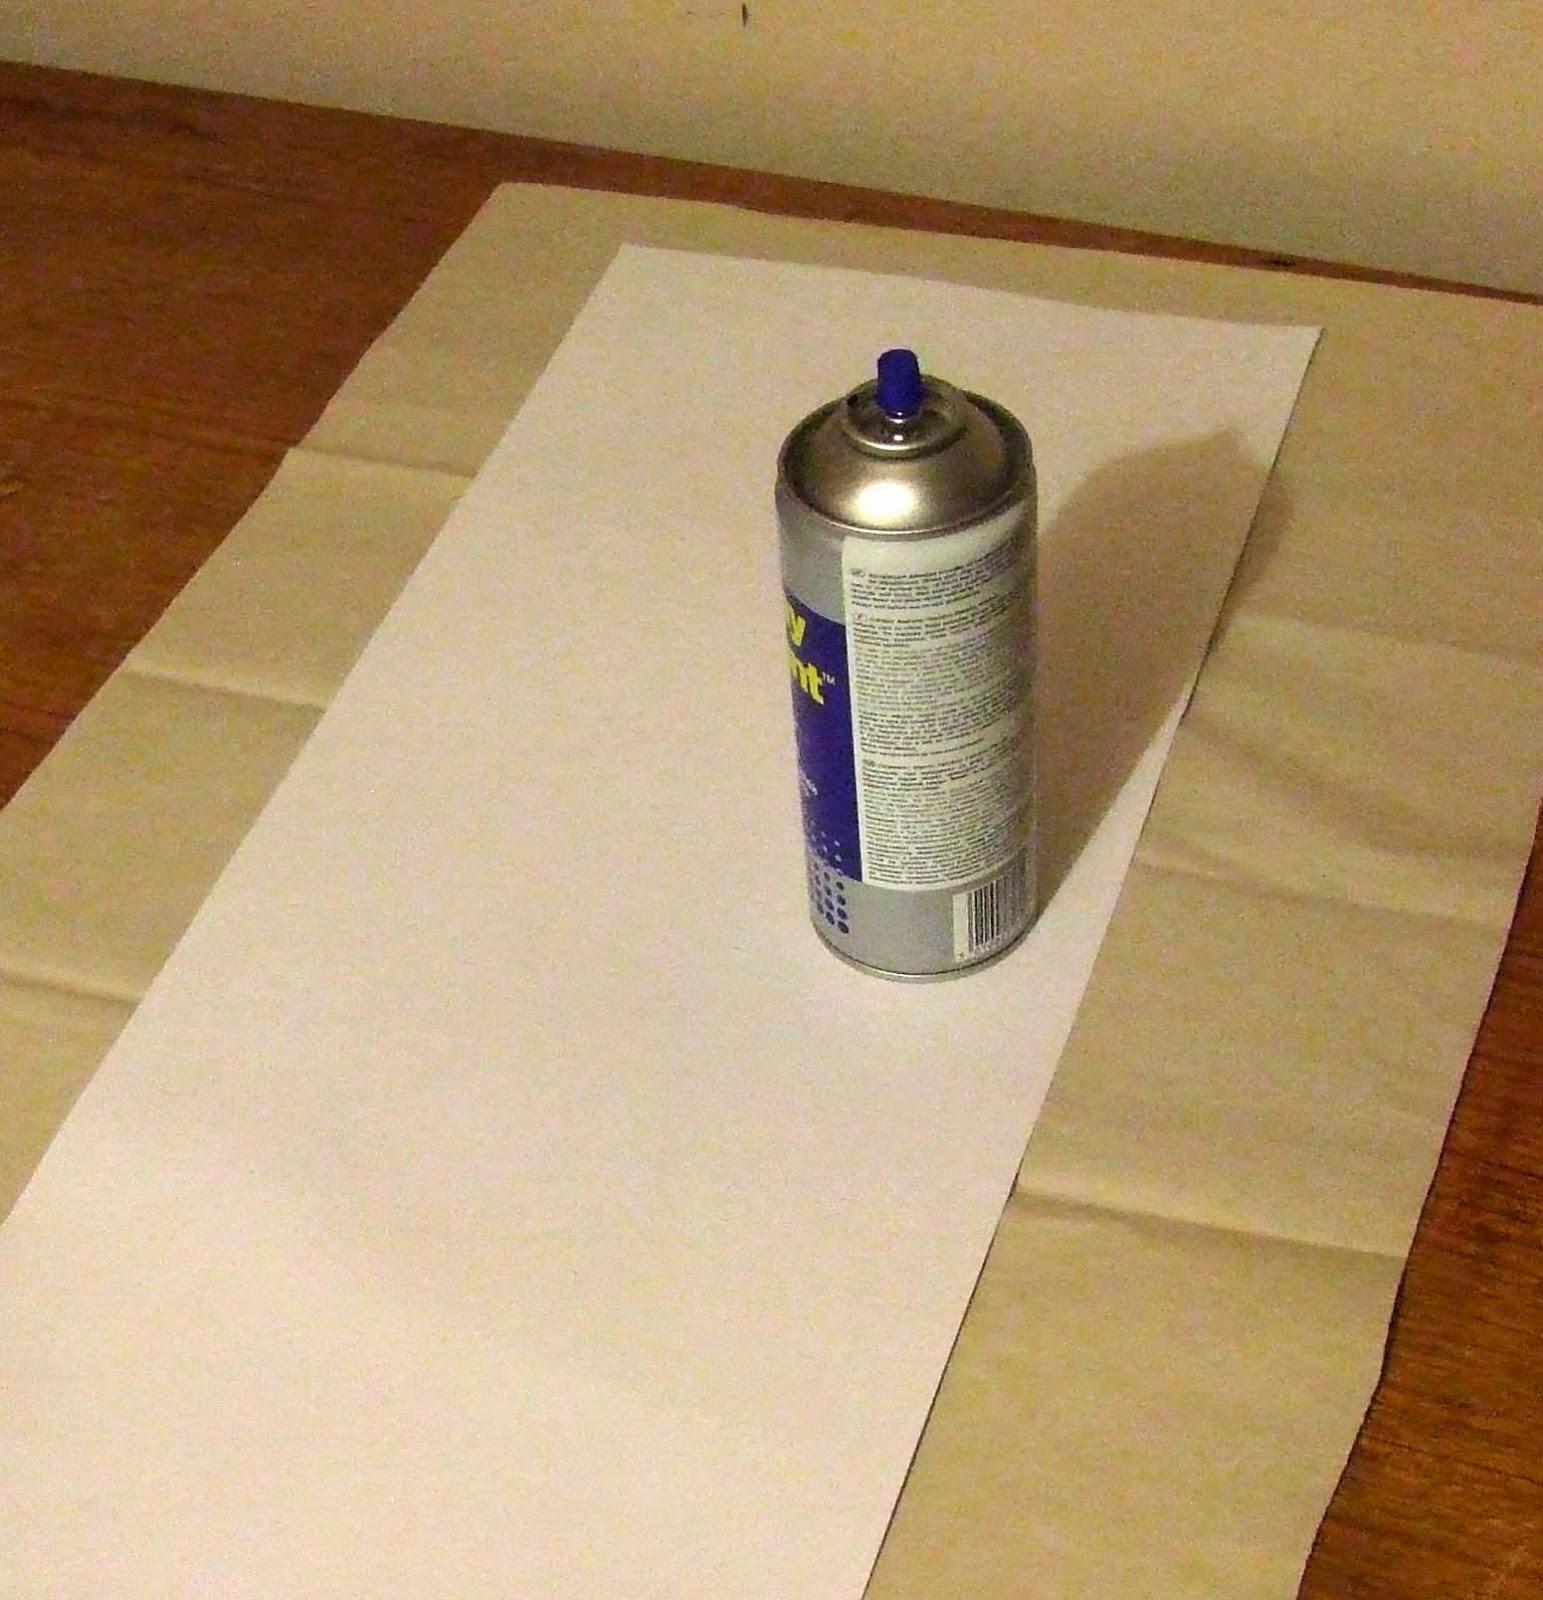 Apply spray mount onto card